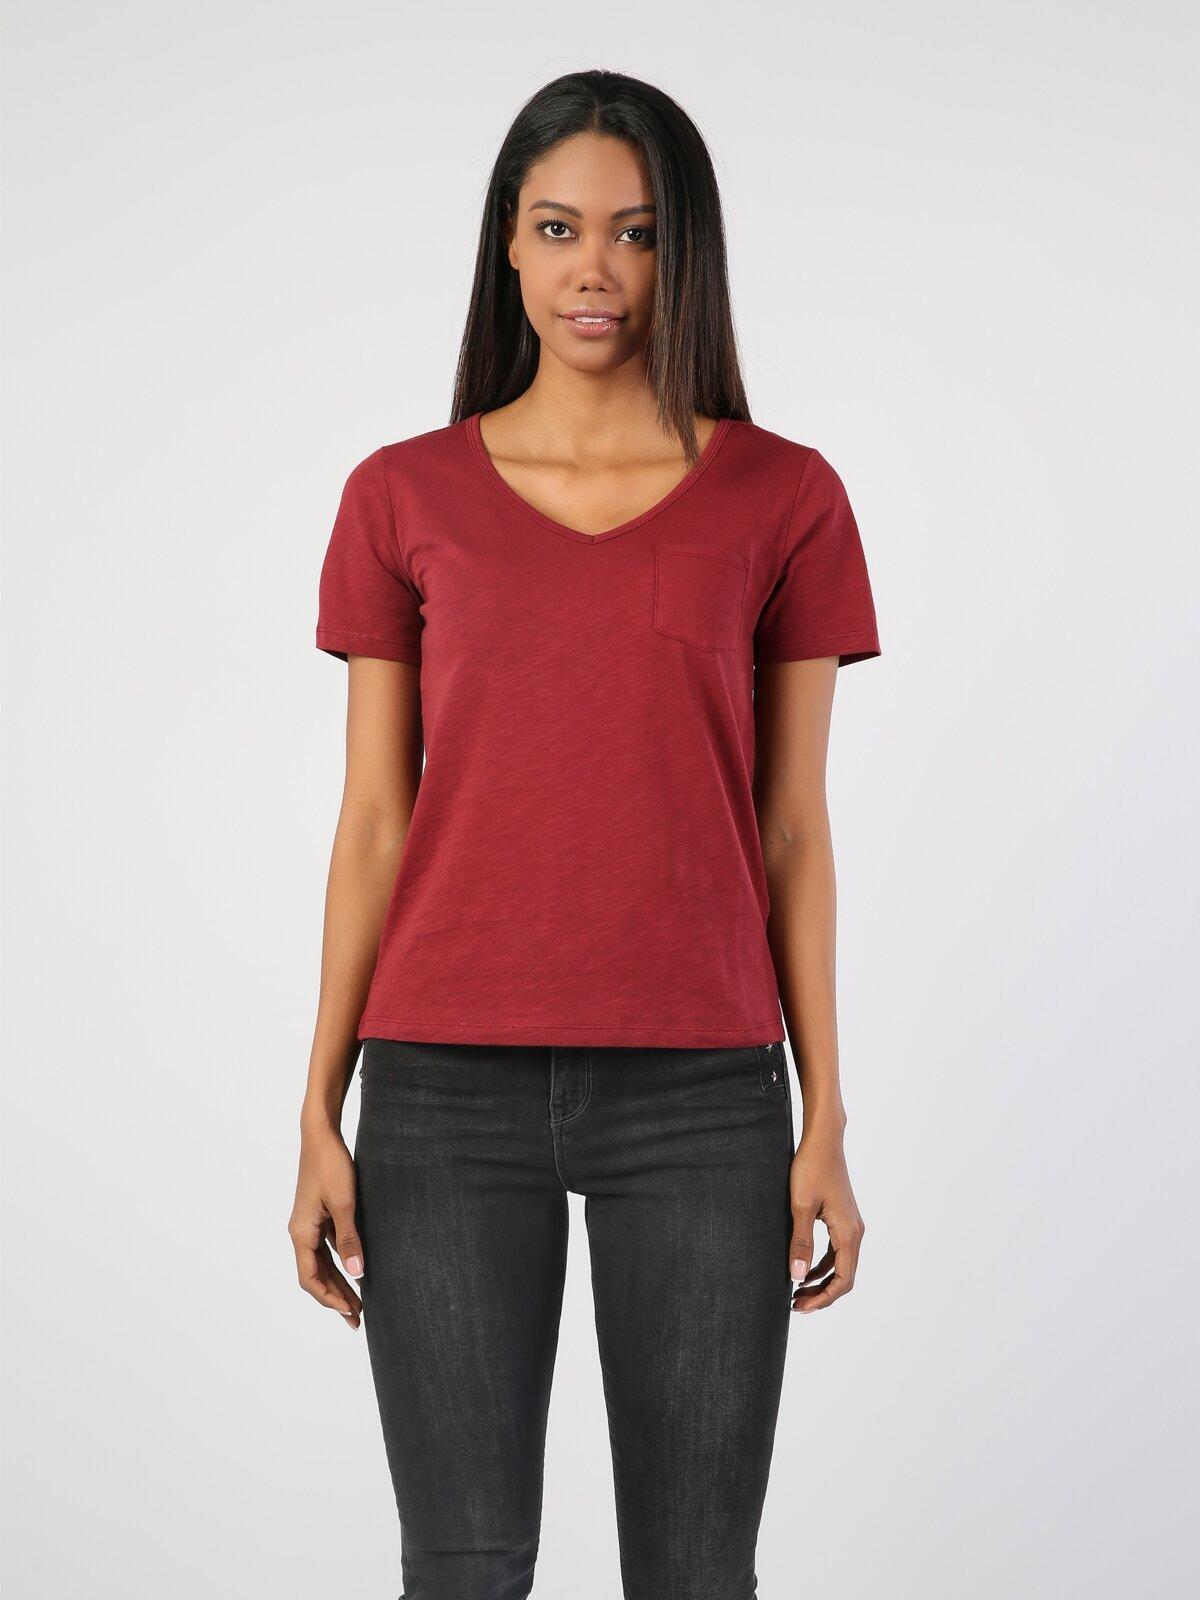 Kırmızı V Yaka Kısa Kol Tişört